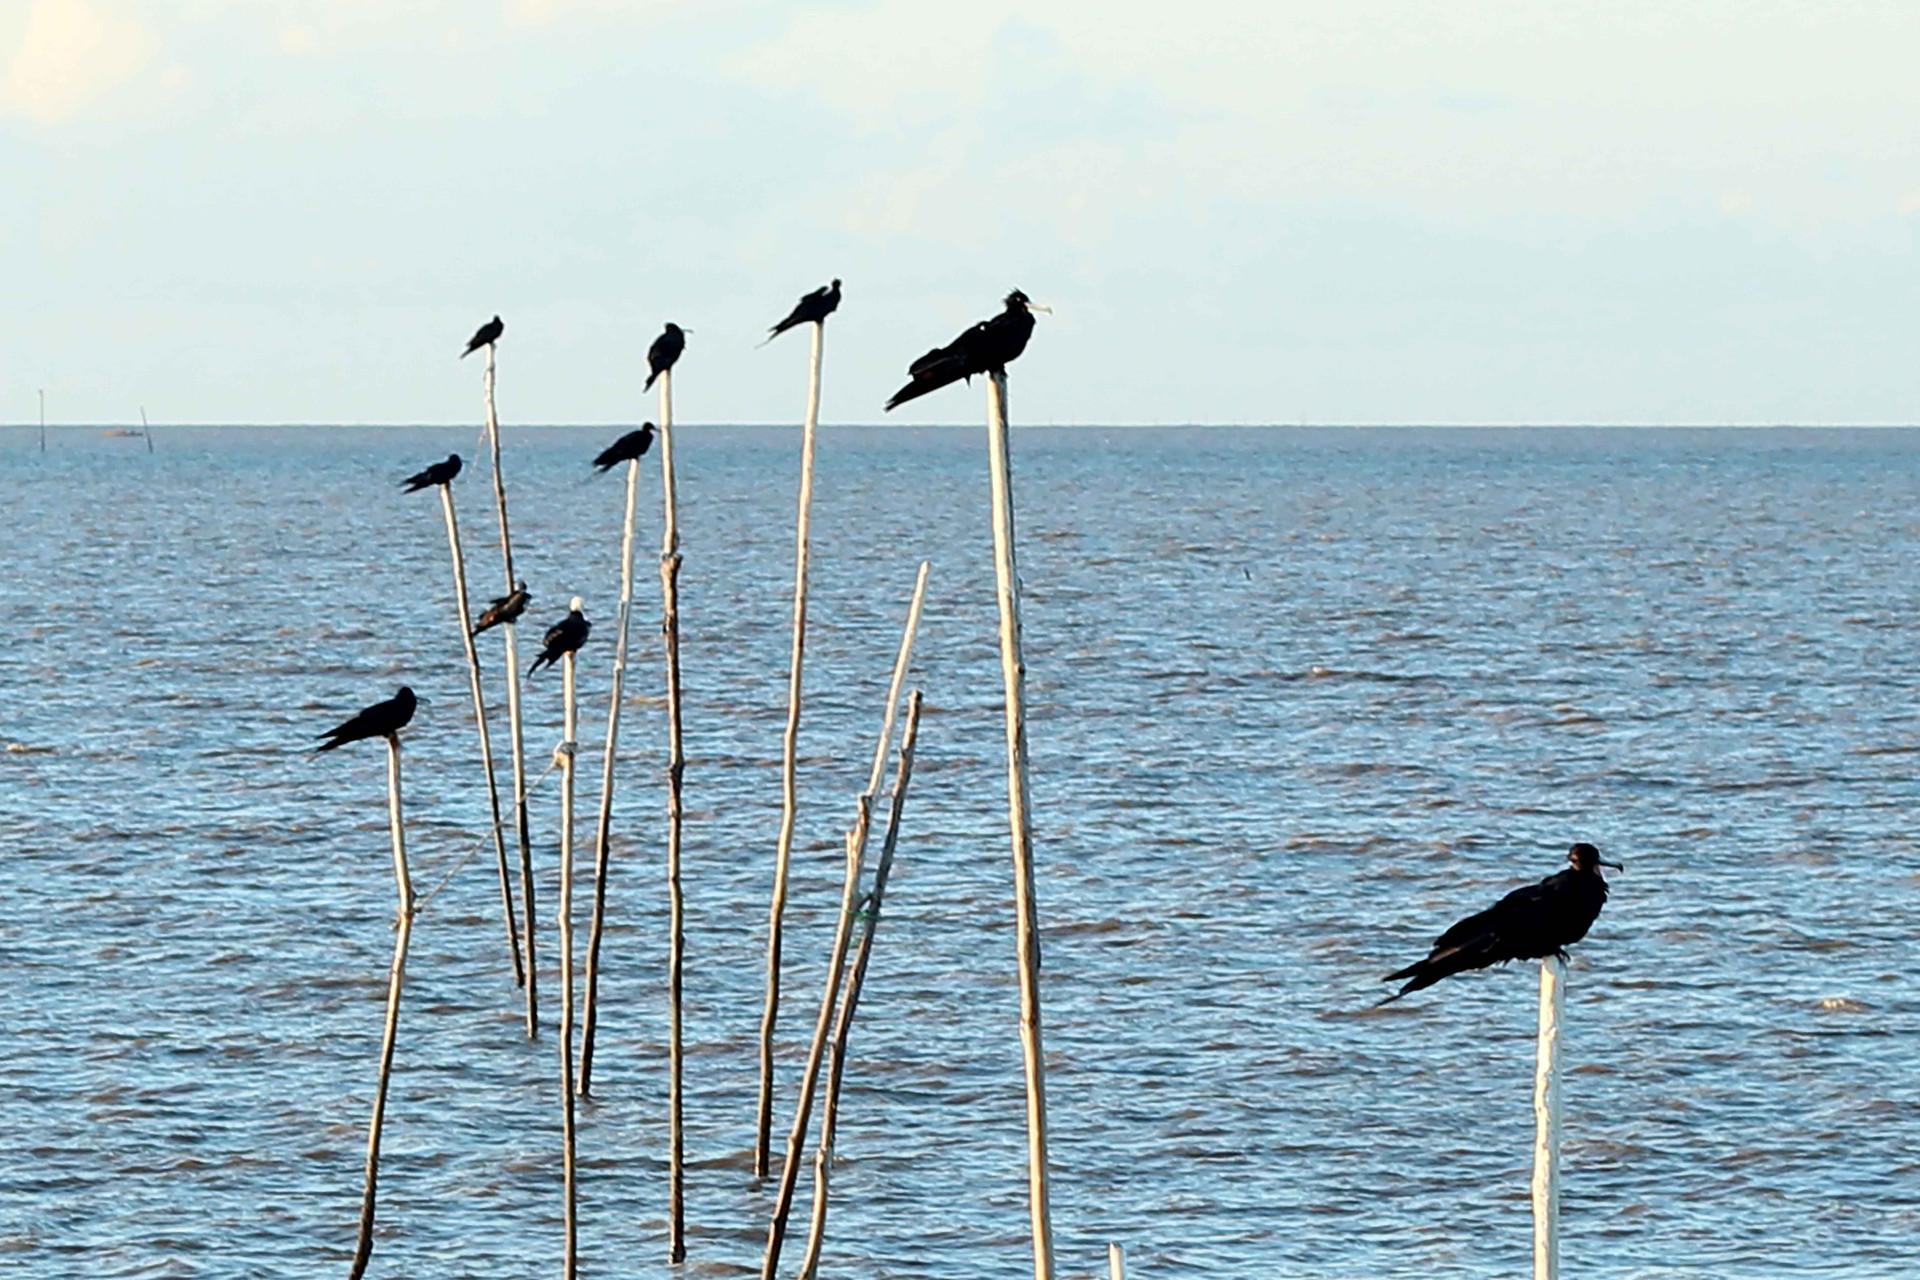 birds_on_sticks.jpg